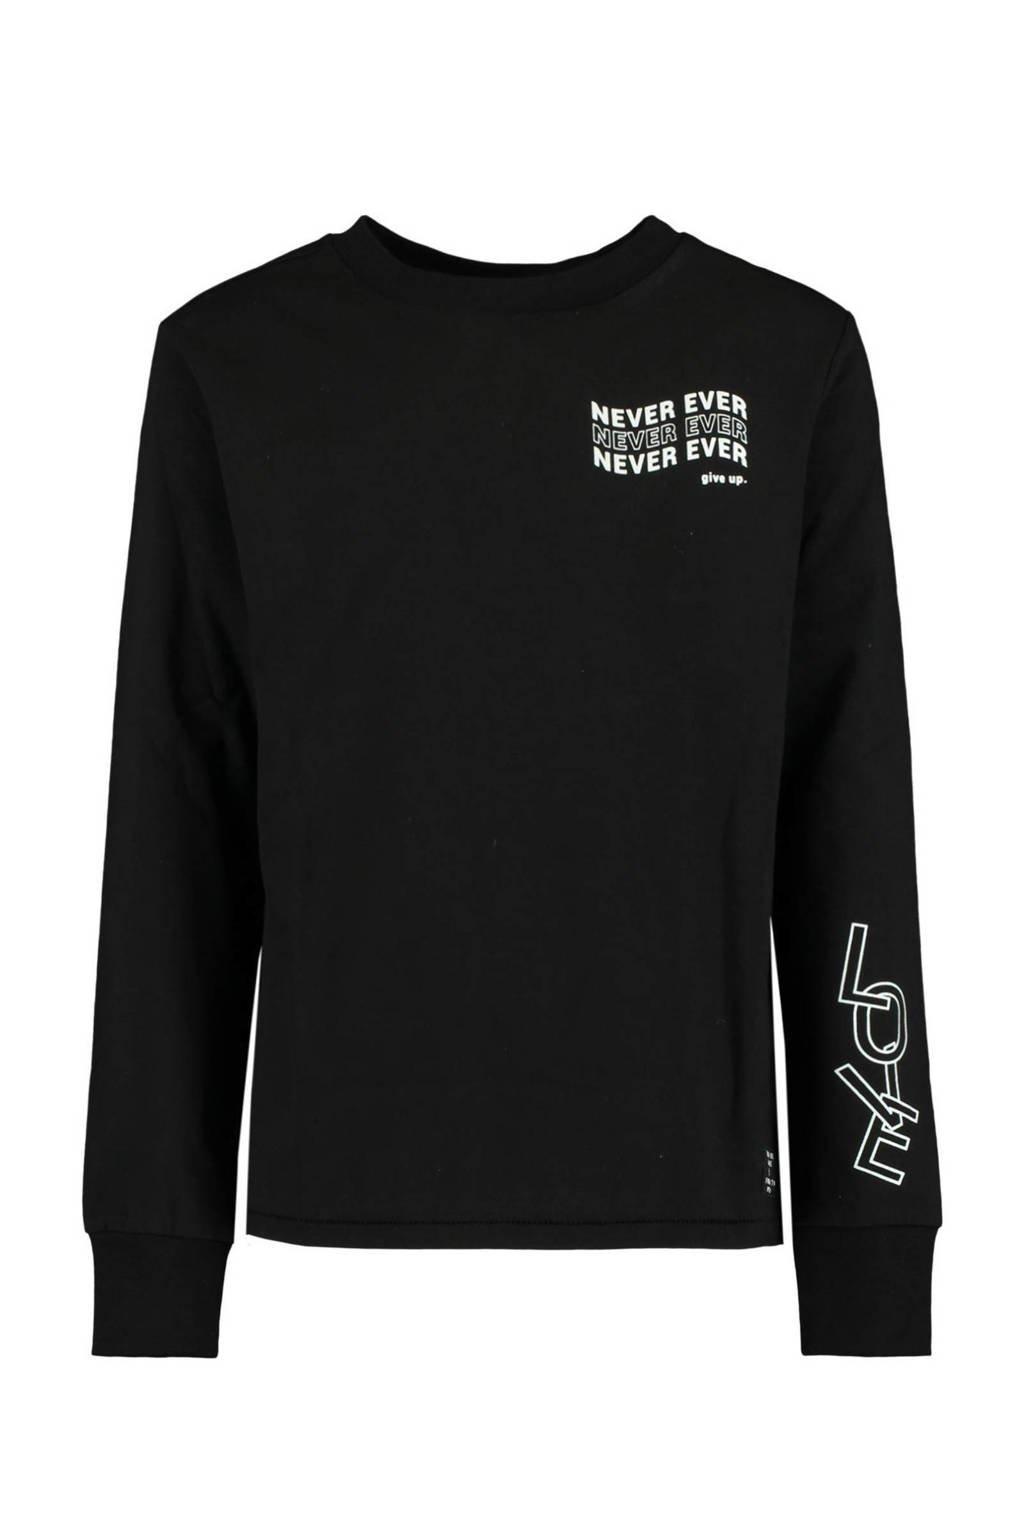 CoolCat Junior longsleeve Lala met tekst zwart/wit, Zwart/wit